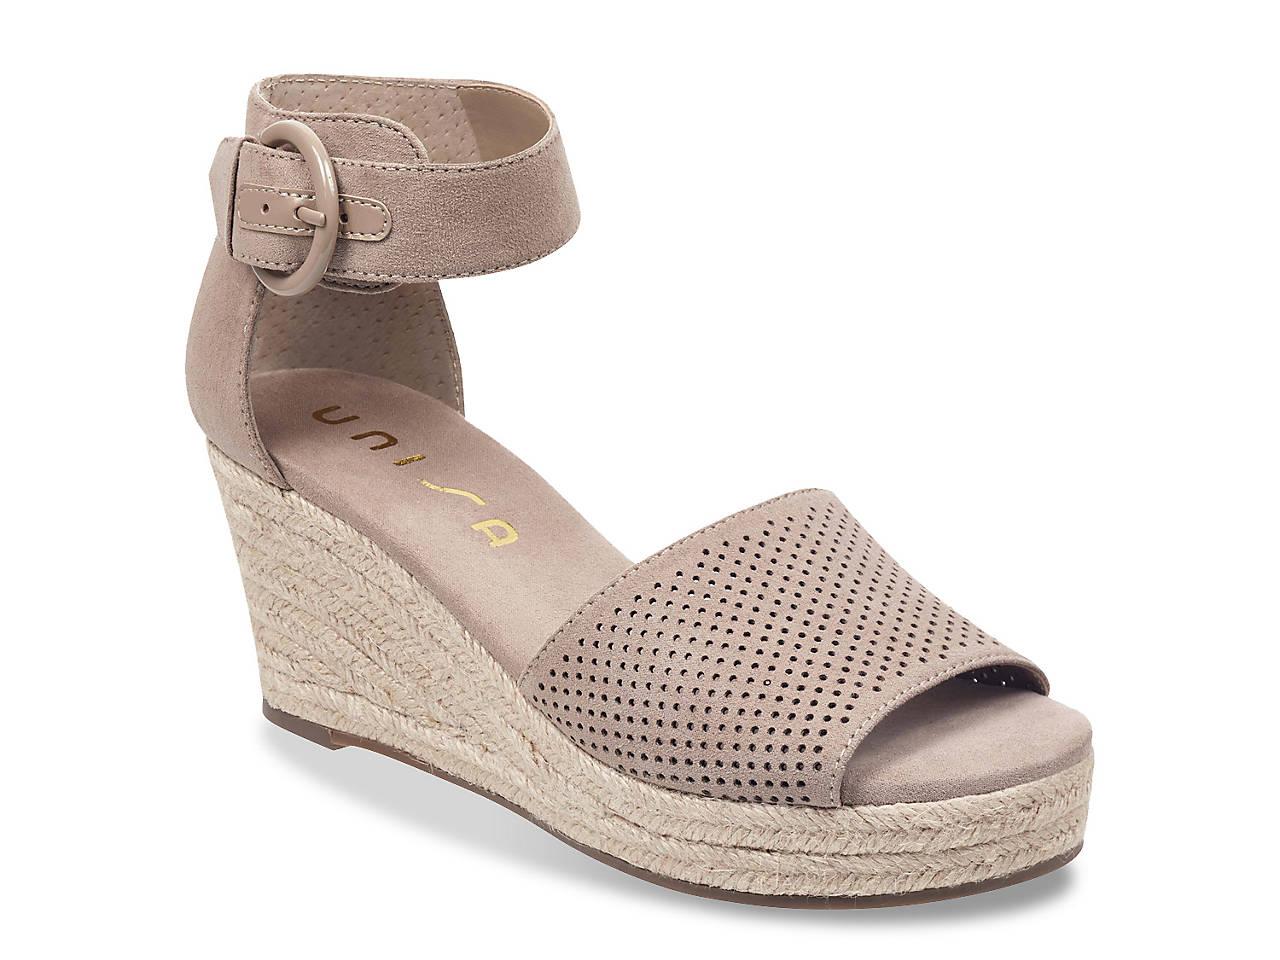 Unisa Hayzi Espadrille Wedge Sandal Women's Shoes | DSW